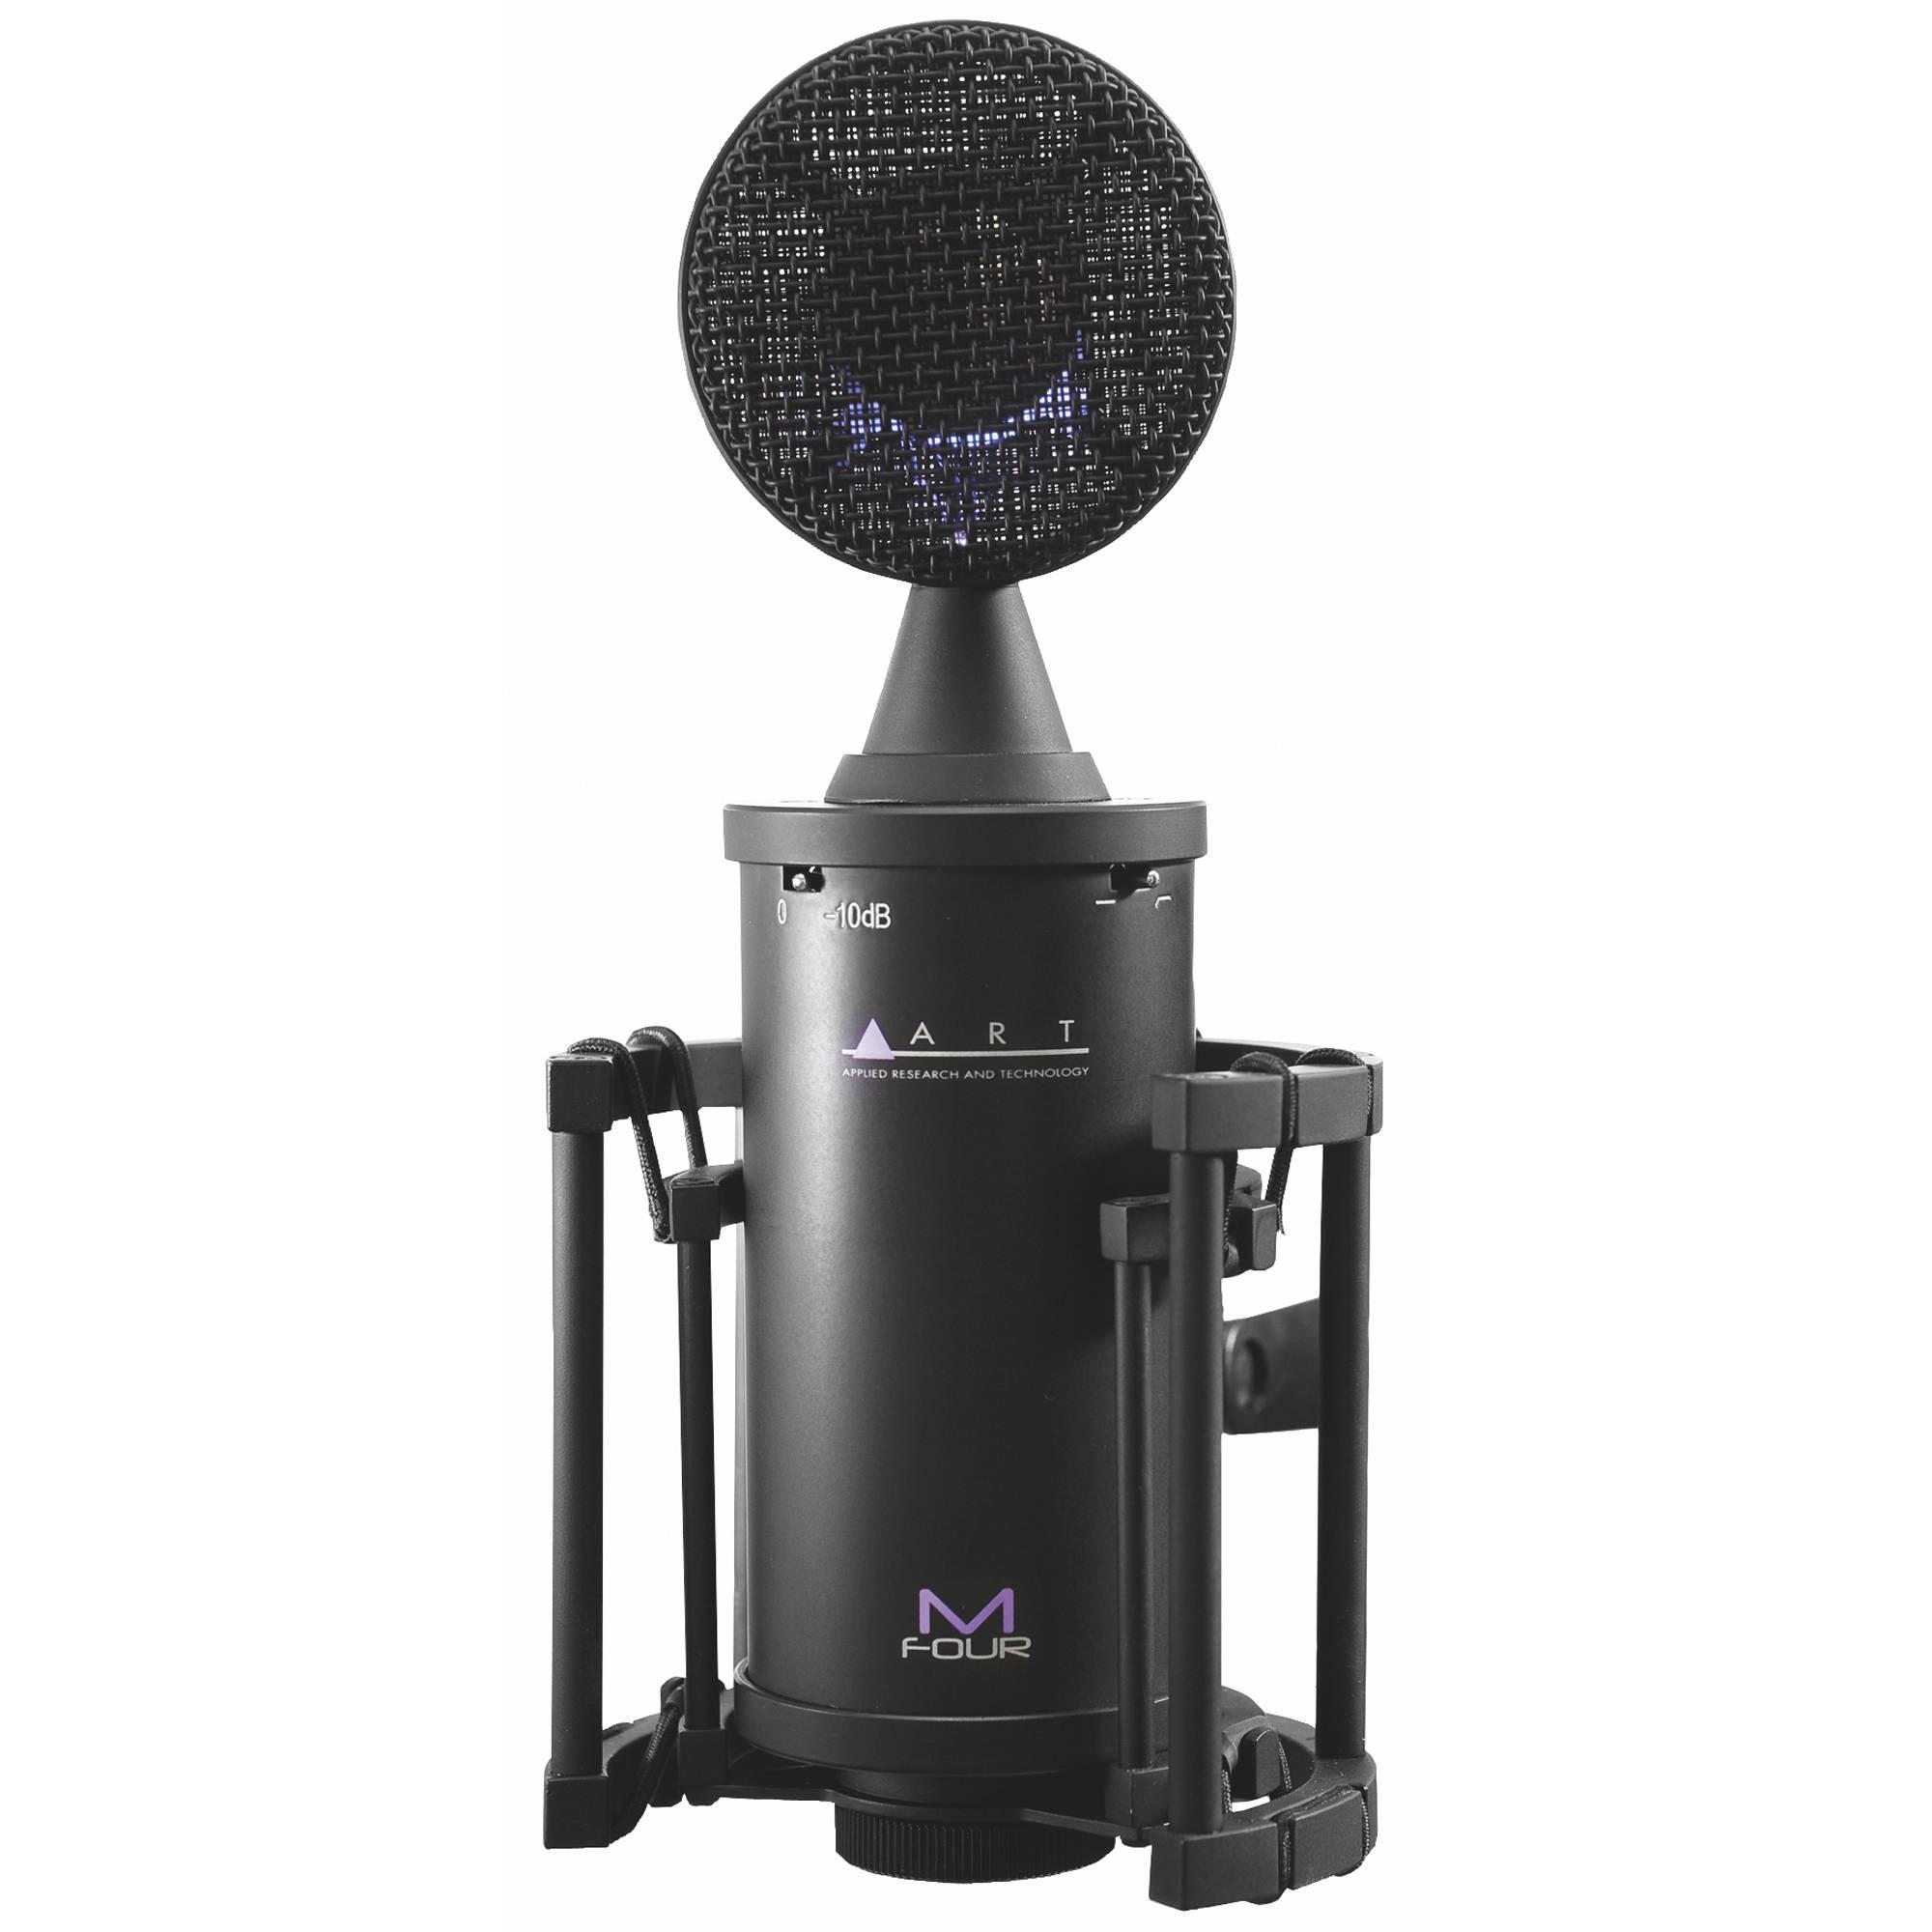 Art M-Four Condenser Microphone